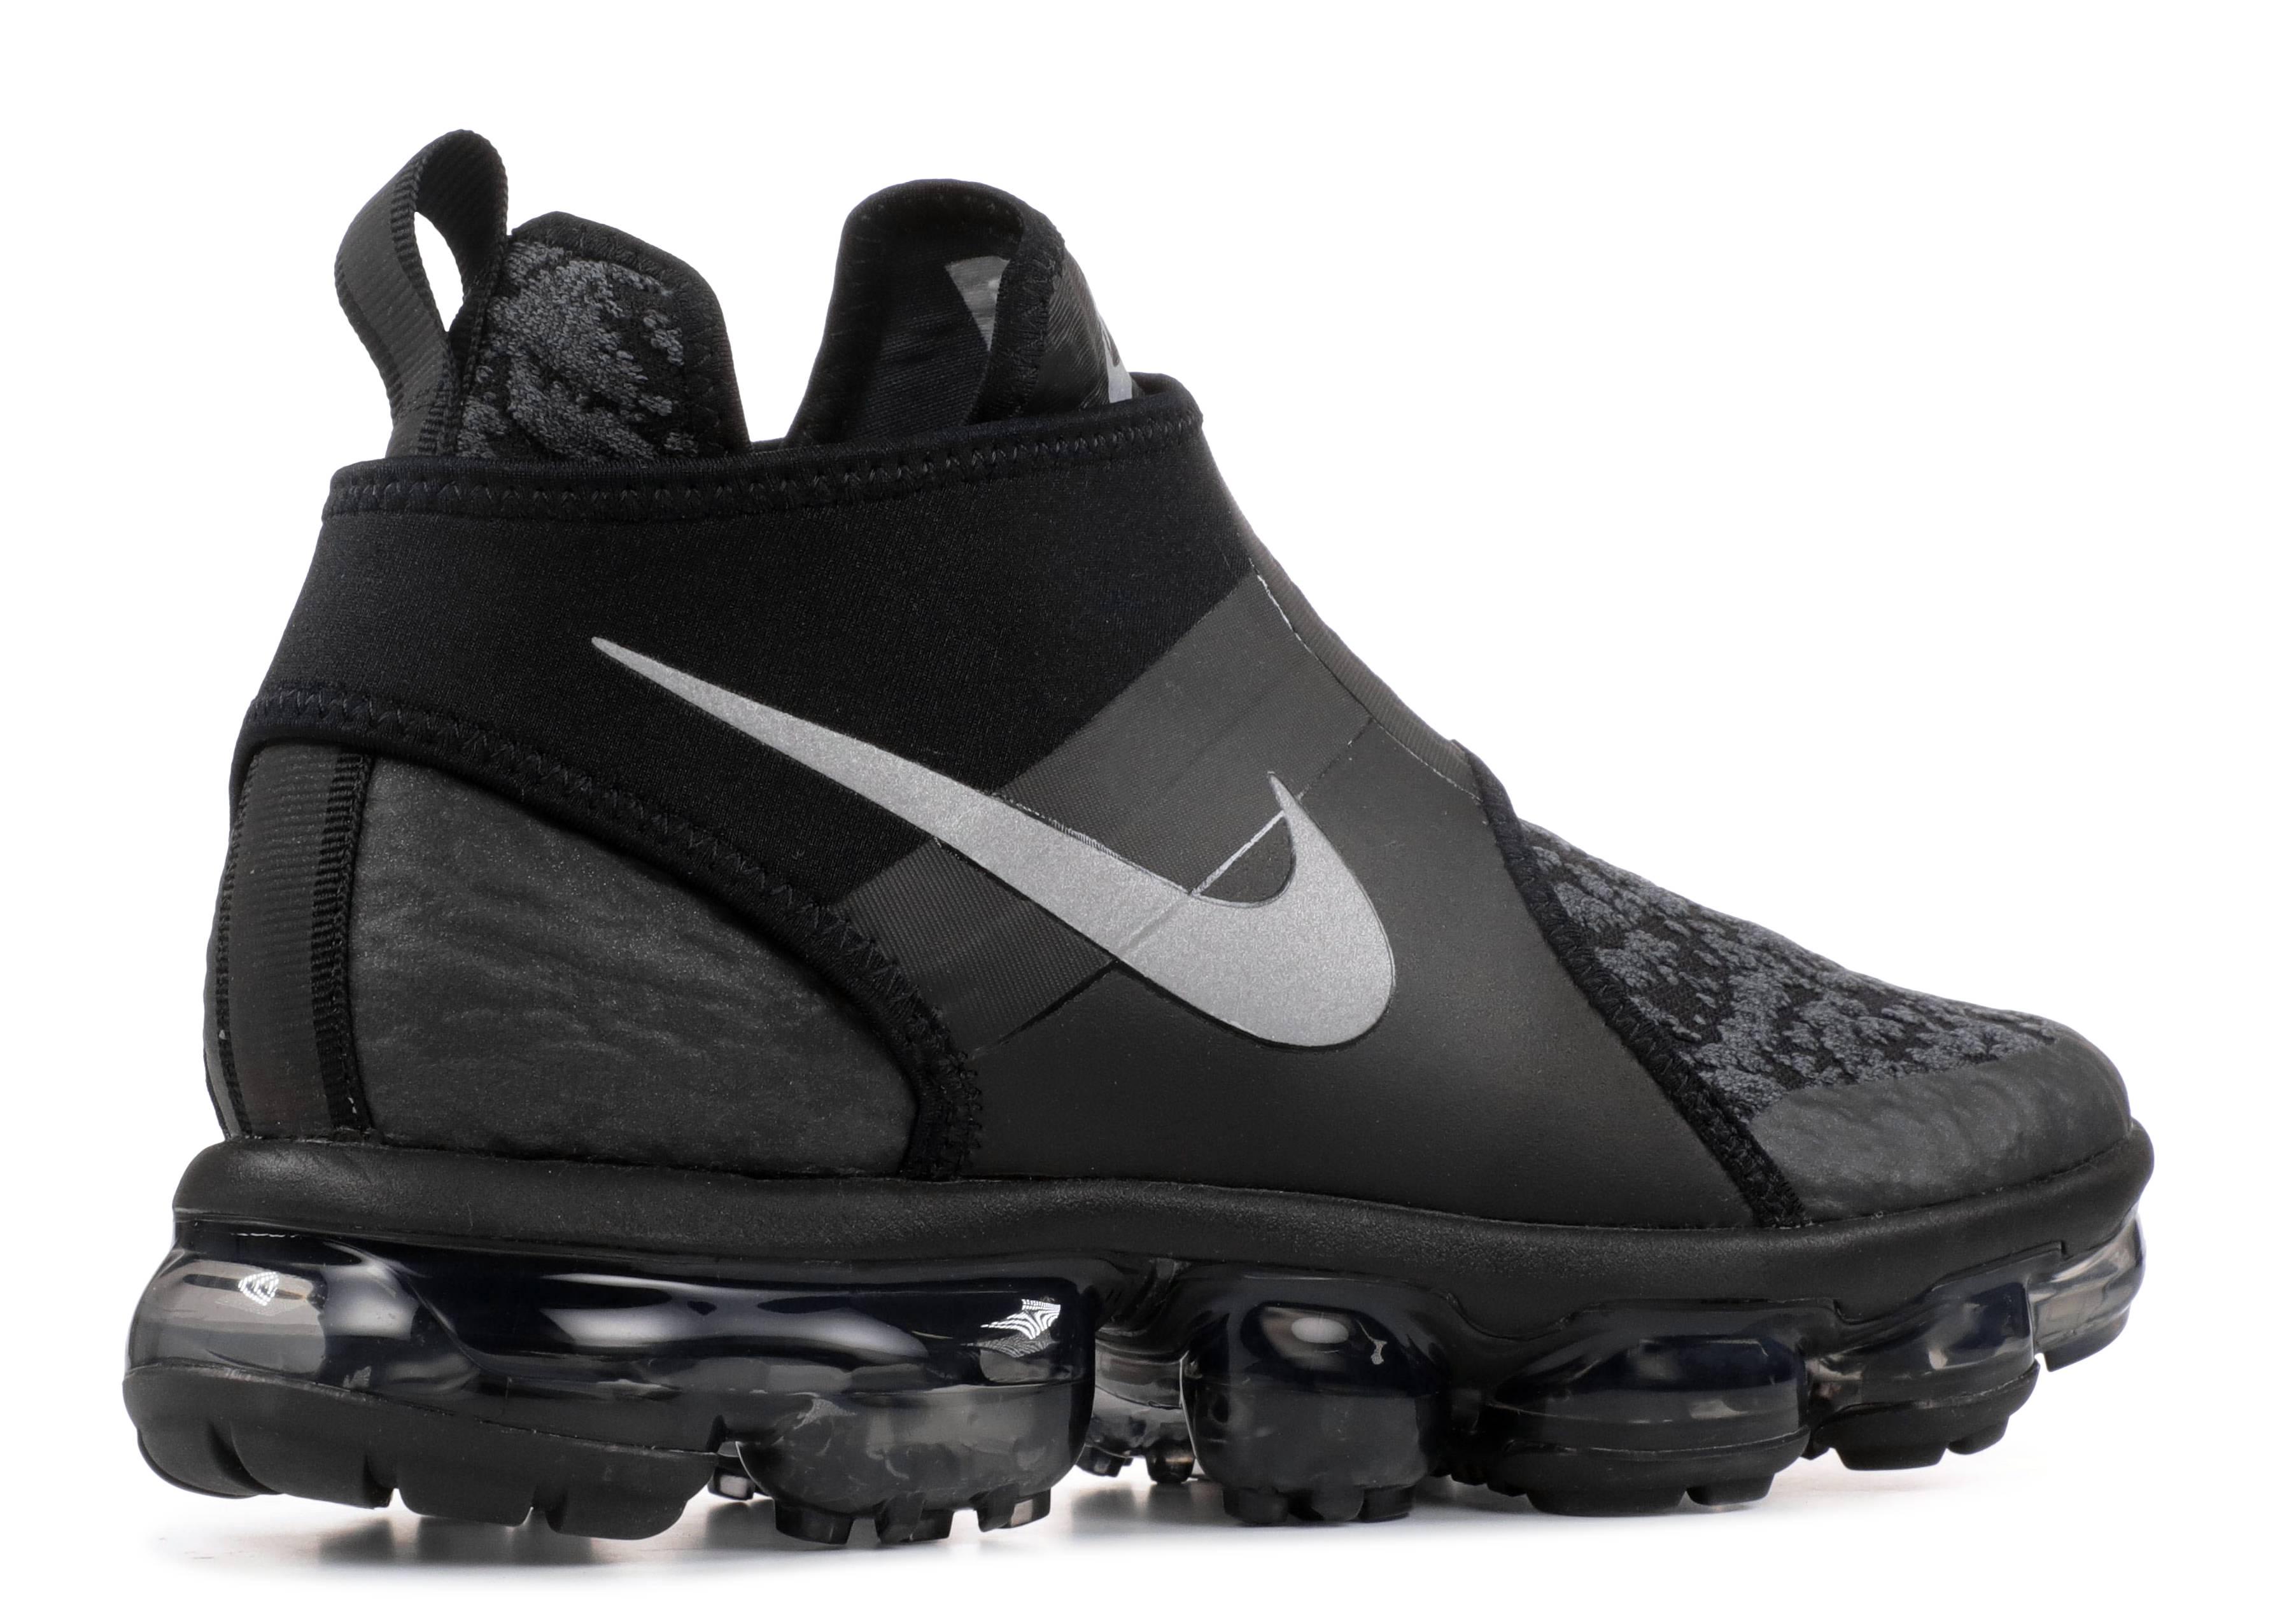 8e479fe0a4 Nike Air Vapormax Chukka Slip - Nike - AO9326 002 - black reflect ...